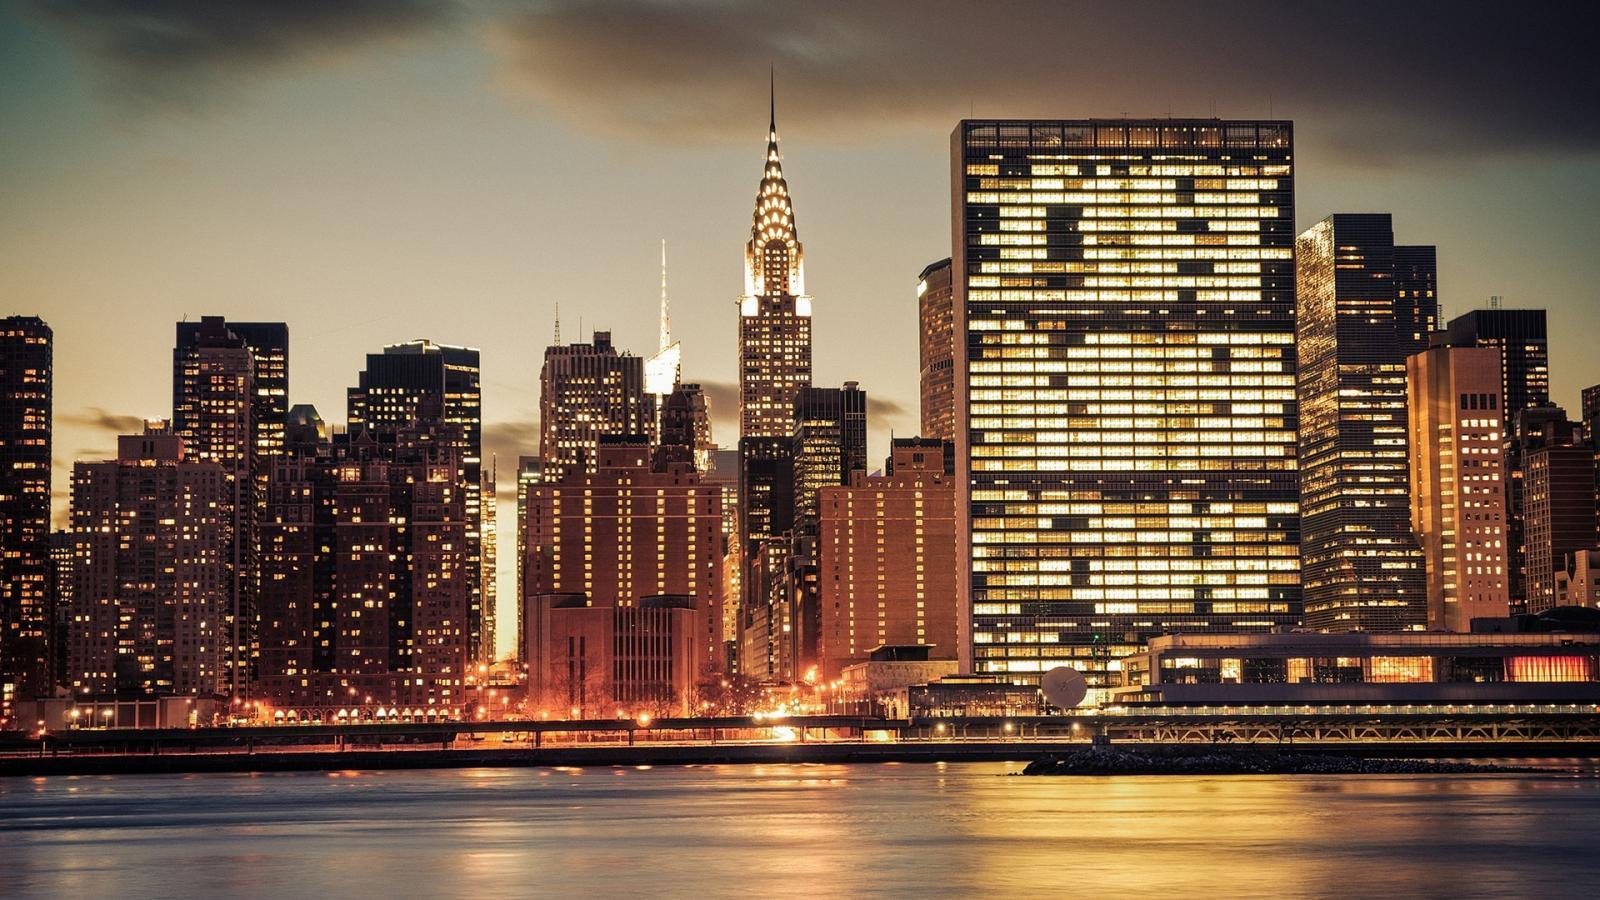 New York City Lights Wallpaper Hd 1600x900